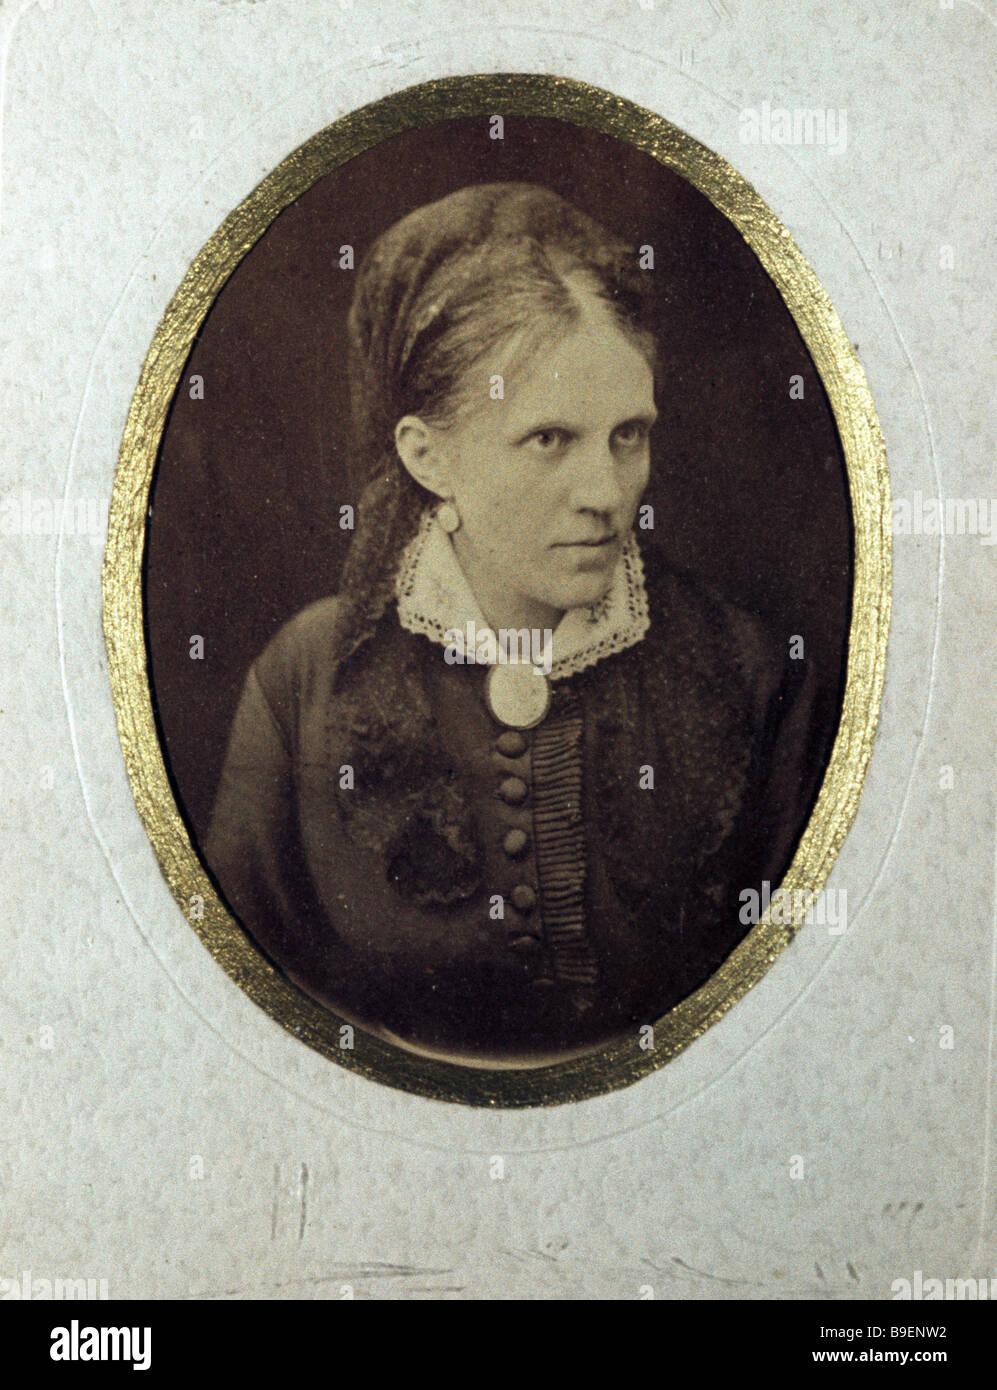 Photograph of Fedor Dostoyevsky s wife Anna Dostoyevskaya from the collection of the Fedor Dostoyevsky Museum Apartment Stock Photo